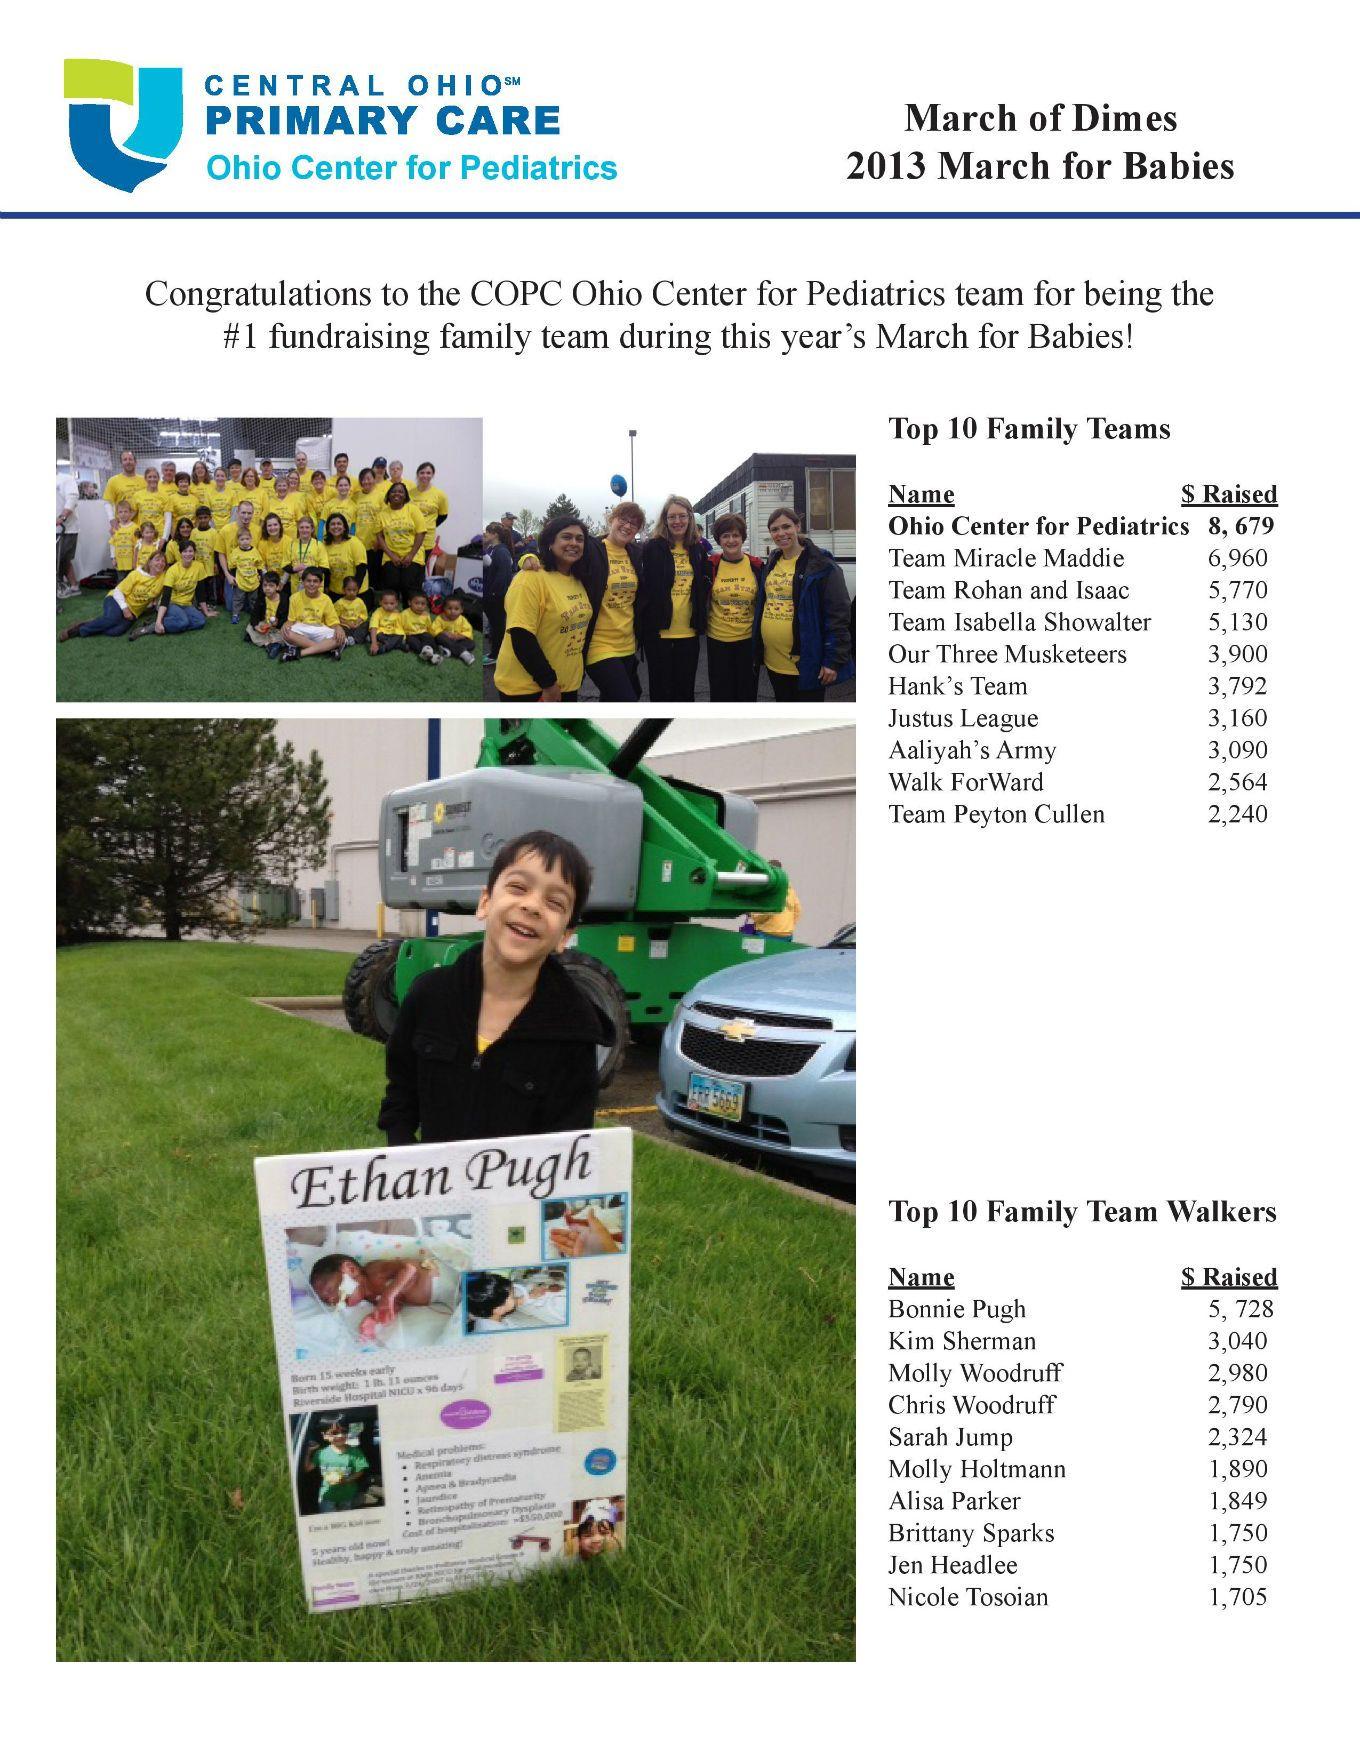 Congratulations to team Ohio Center for Pediatrics! | Central Ohio